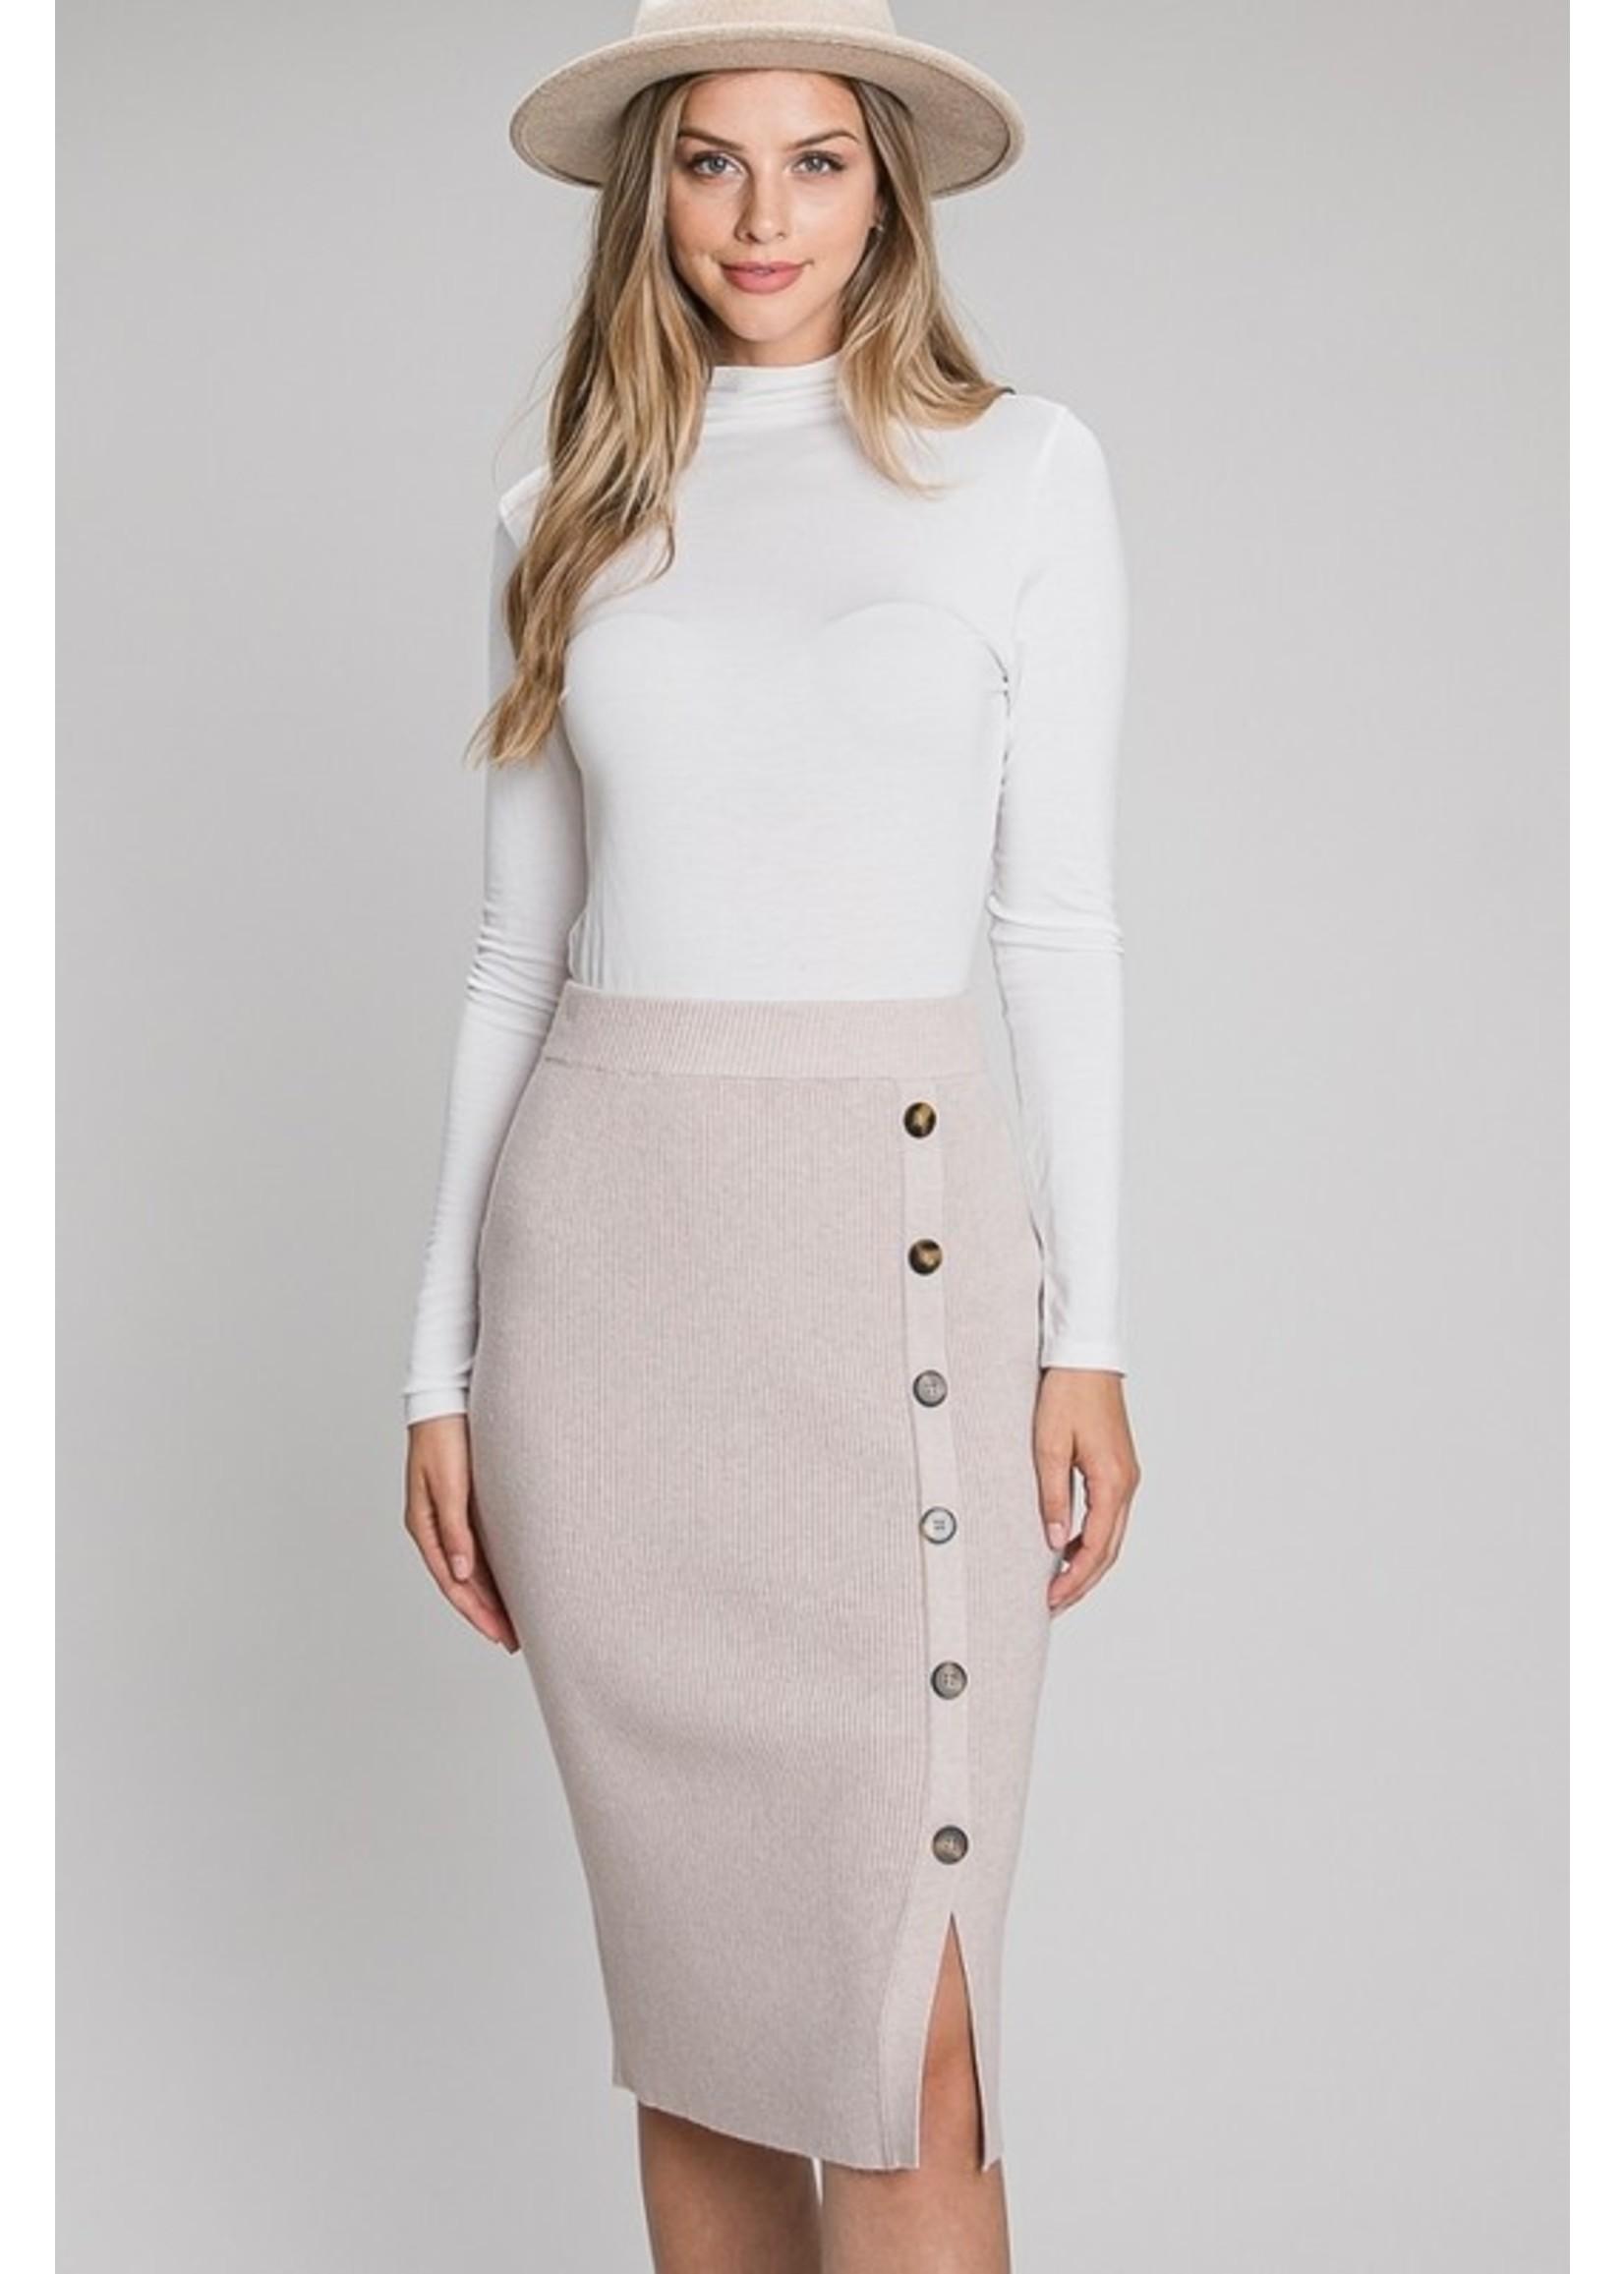 Allie Rose Downtown Girl Pencil Skirt Mauve